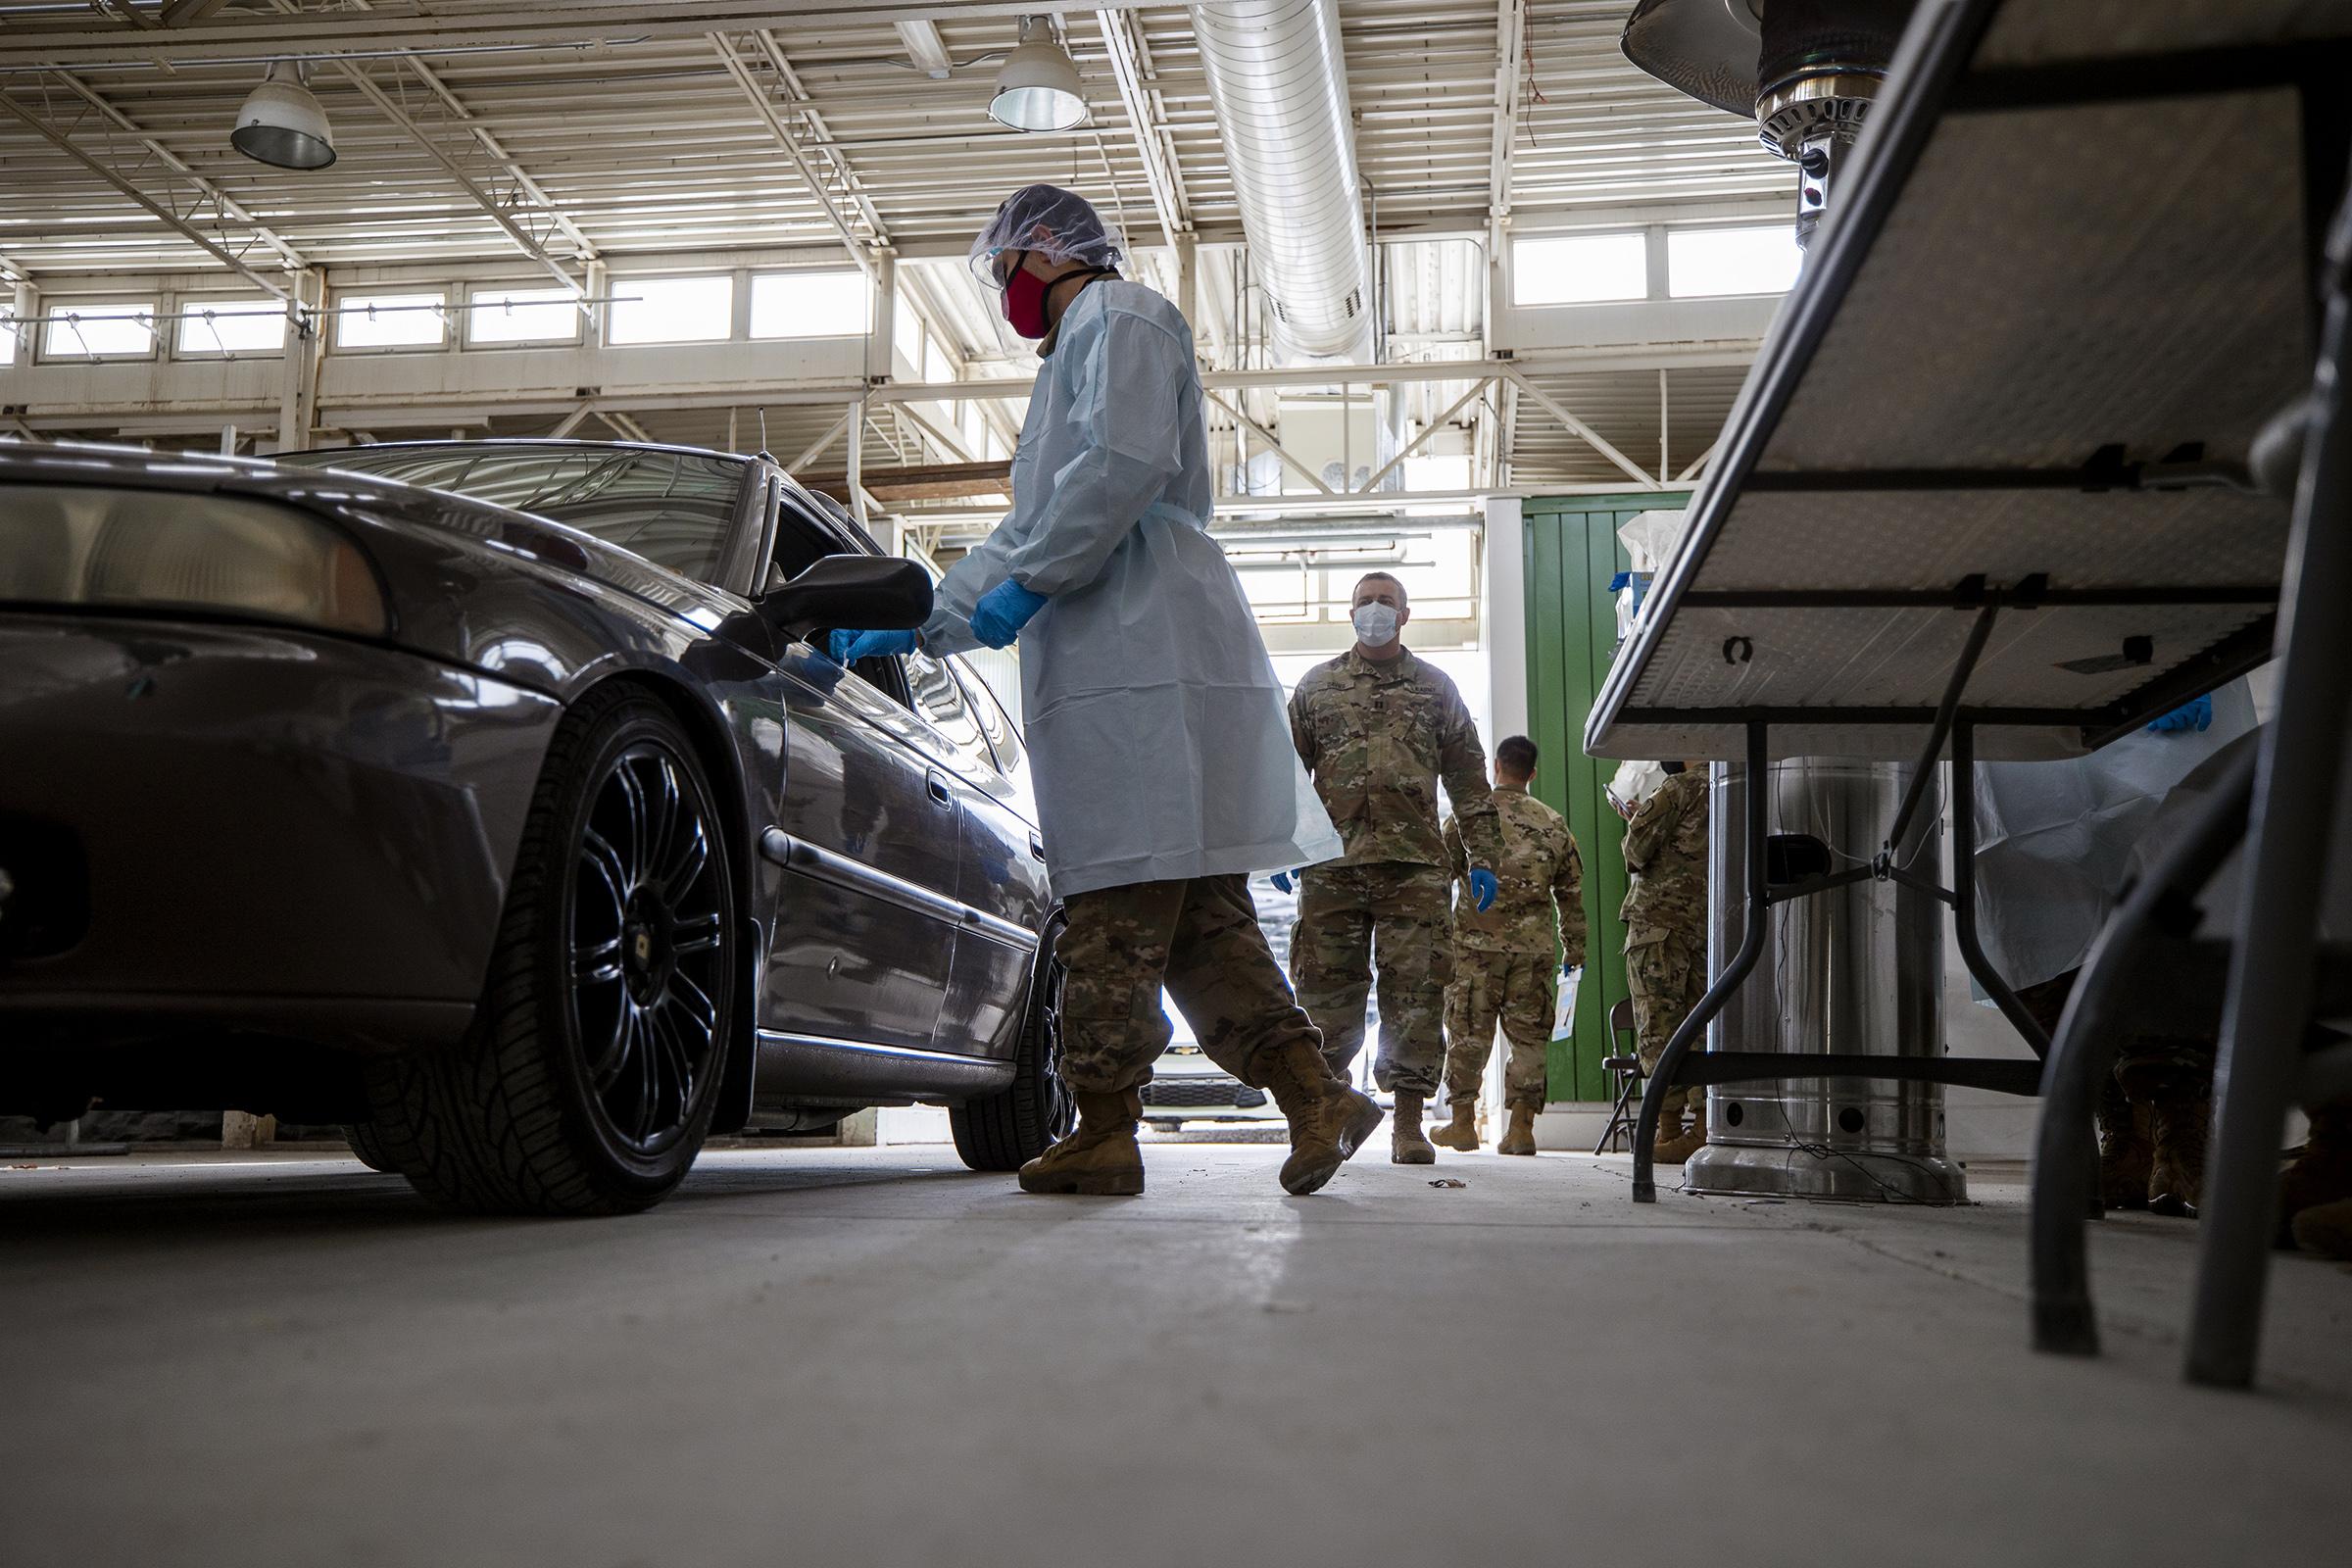 Members of the Utah National Guard work at a COVID-19 testing center